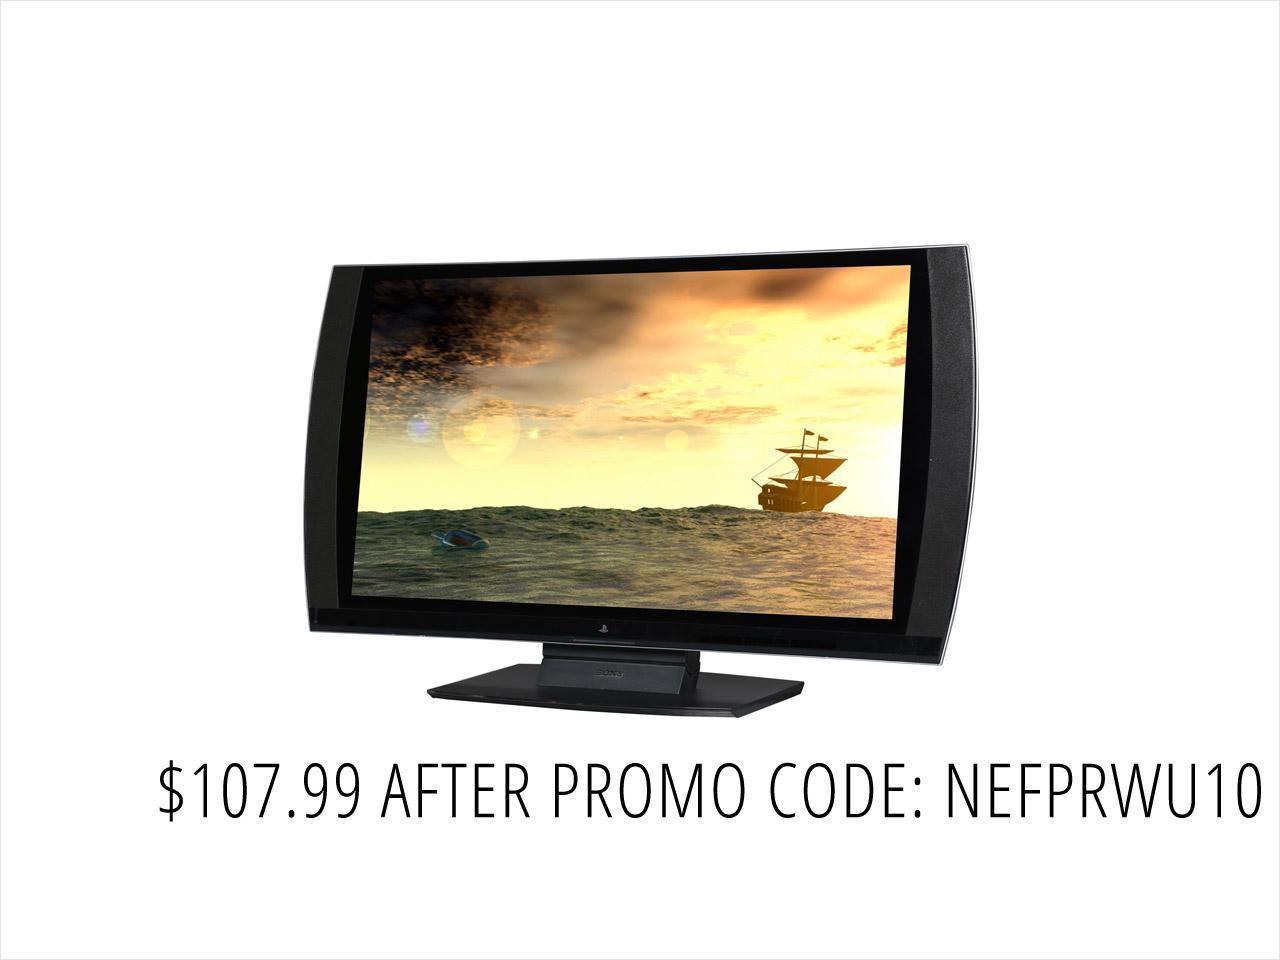 "Refurbished: SONY CECH-ZED1U-PB-R-A 24"" HDMI LED Backlight LCD 3D Monitor Grade A"